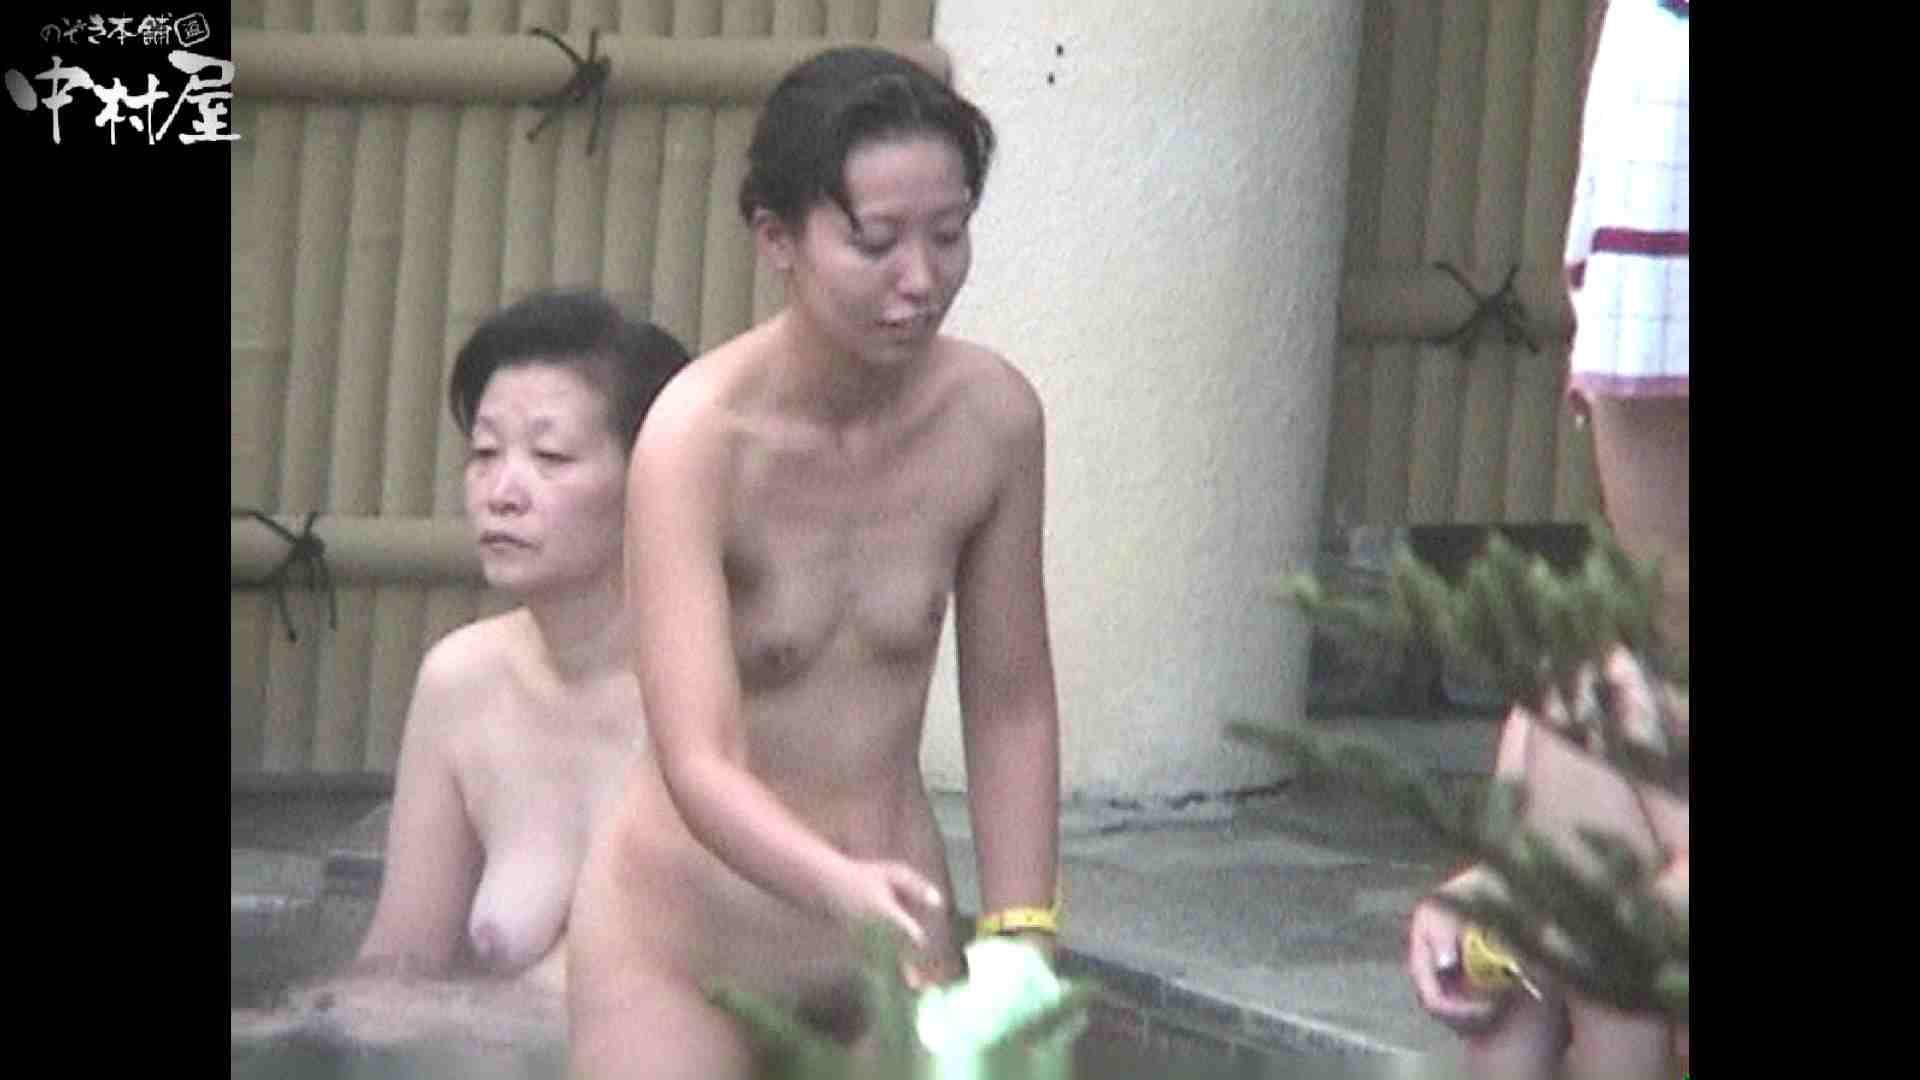 Aquaな露天風呂Vol.931 OLセックス 盗撮オマンコ無修正動画無料 67画像 17